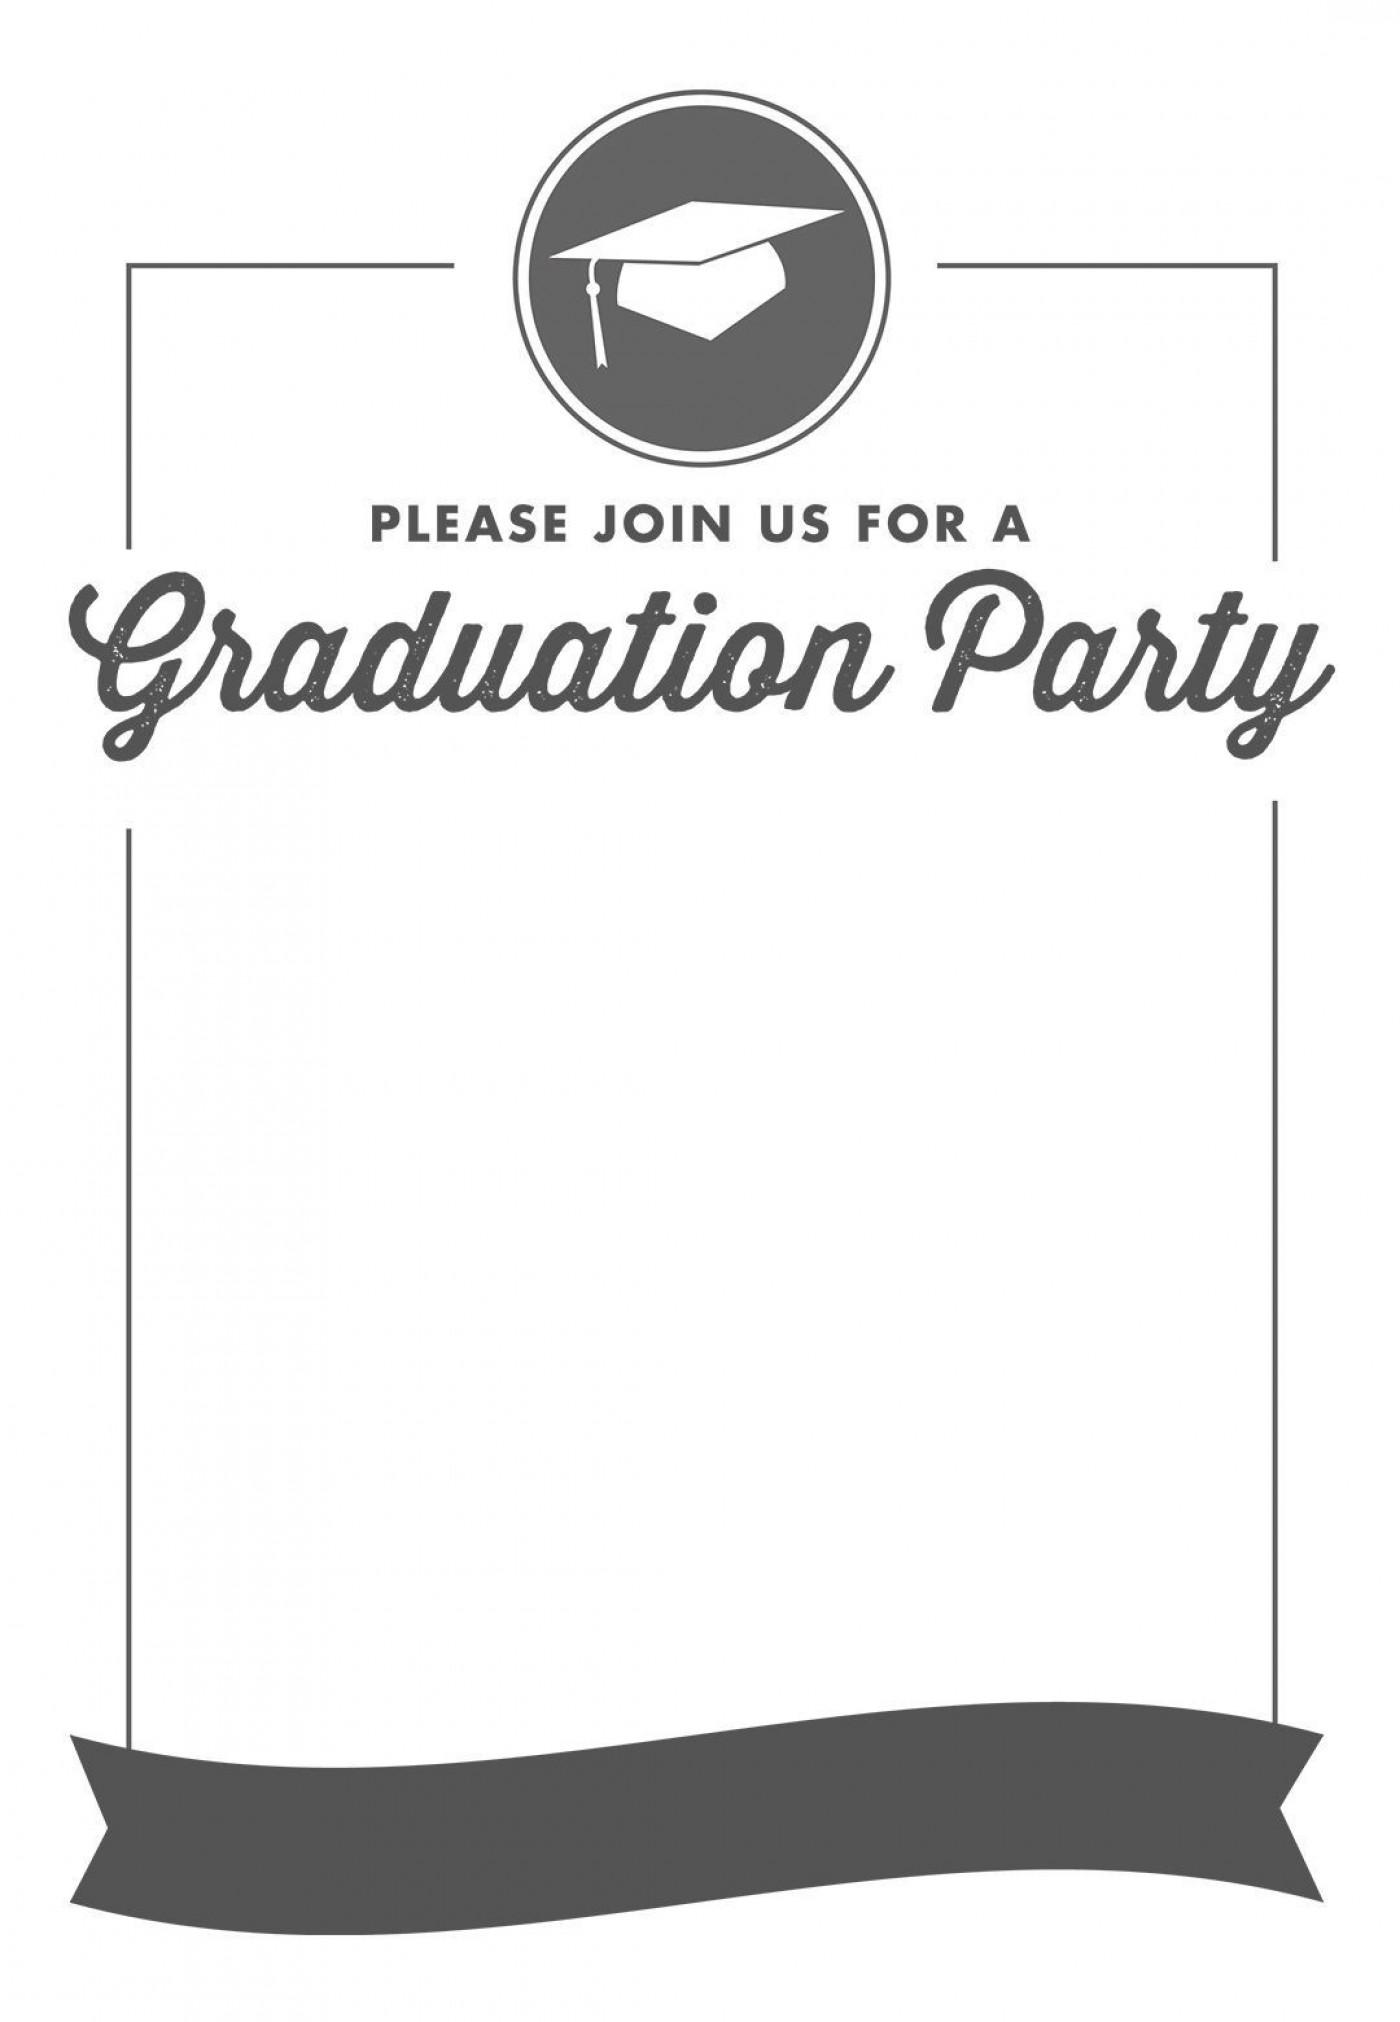 002 Unbelievable Free Graduation Invitation Template Printable High Resolution  Kindergarten Party Card1400